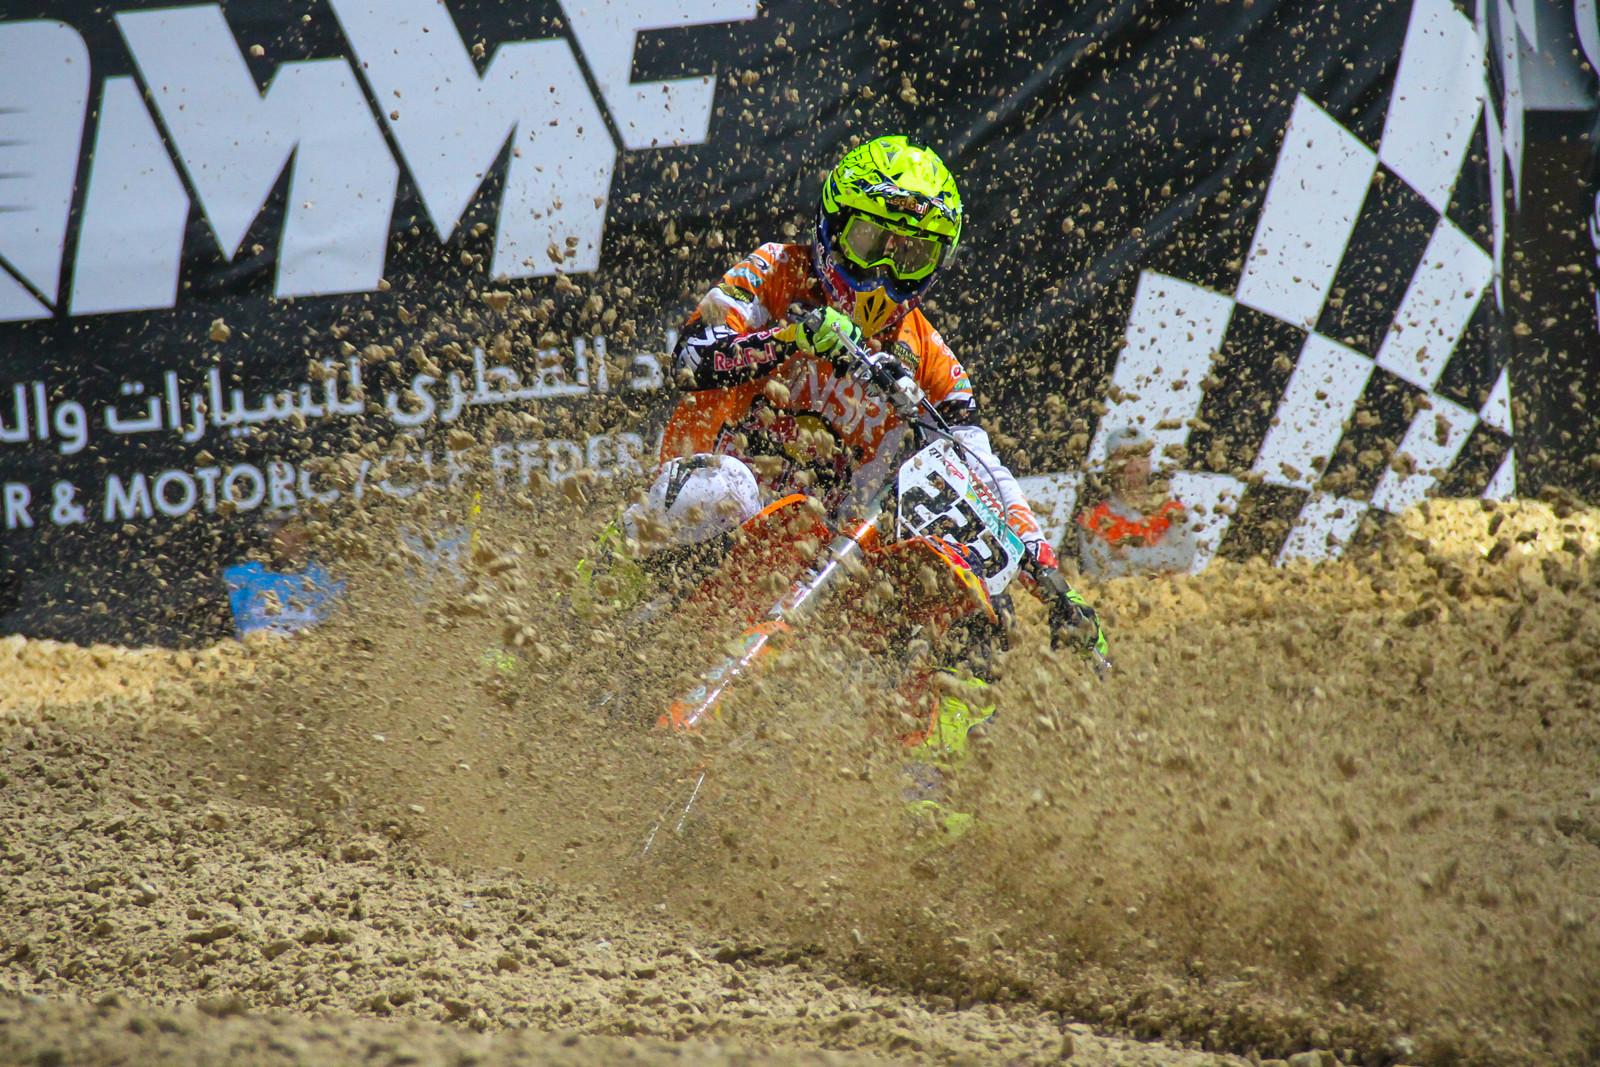 Antonio Cairoli - Photo Blast: 2017 MXGP of Qatar - Motocross Pictures - Vital MX